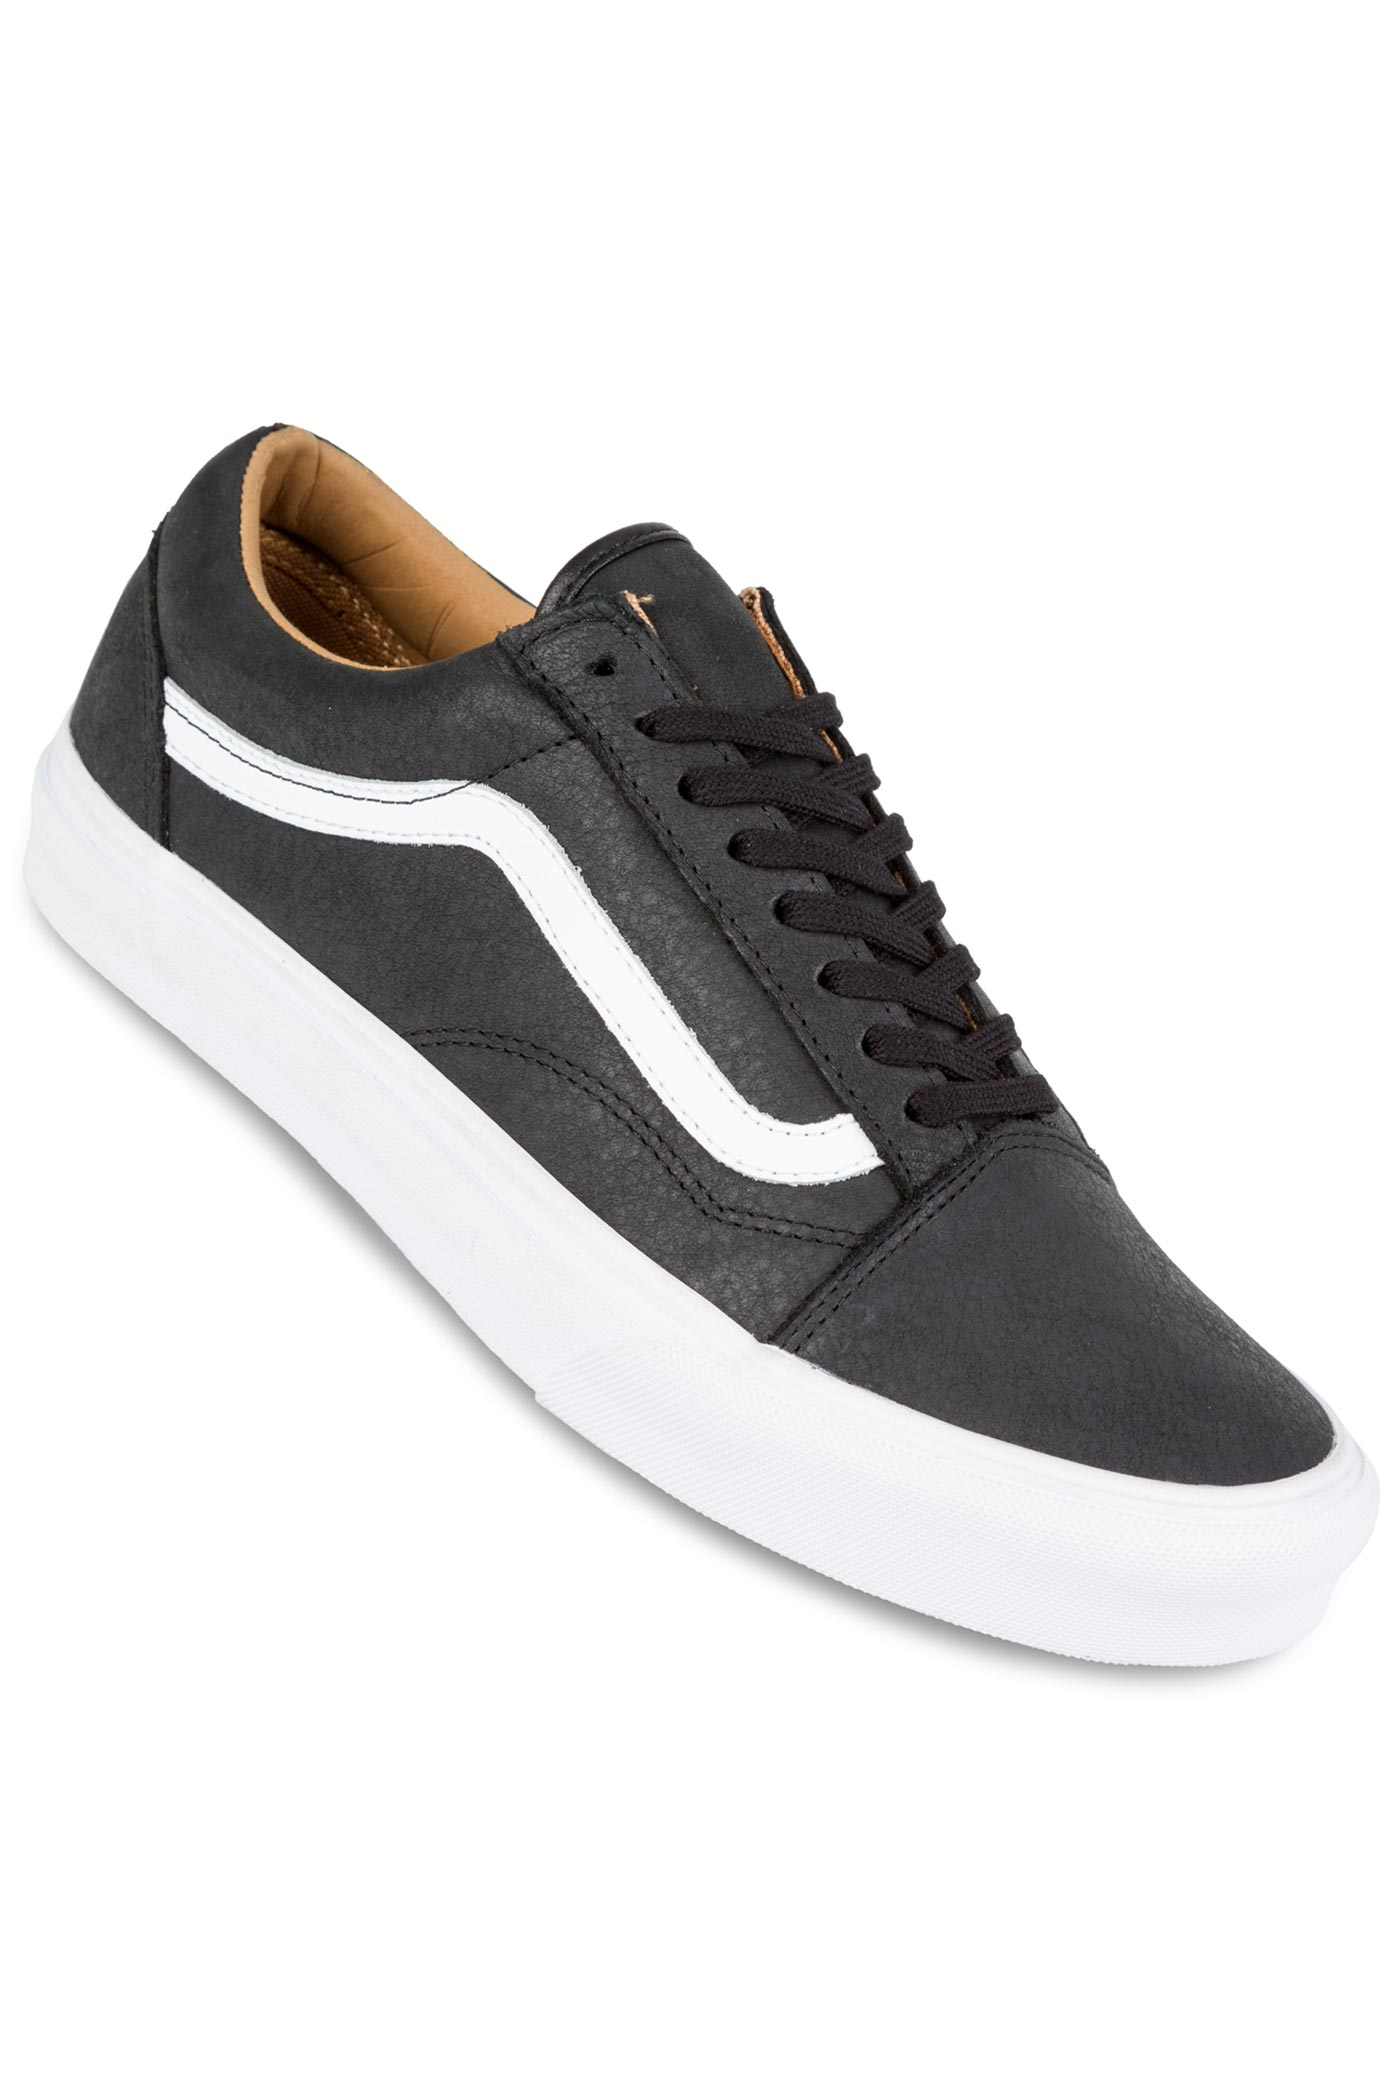 vans old skool premium leather chaussure black true white achetez sur skatedeluxe. Black Bedroom Furniture Sets. Home Design Ideas